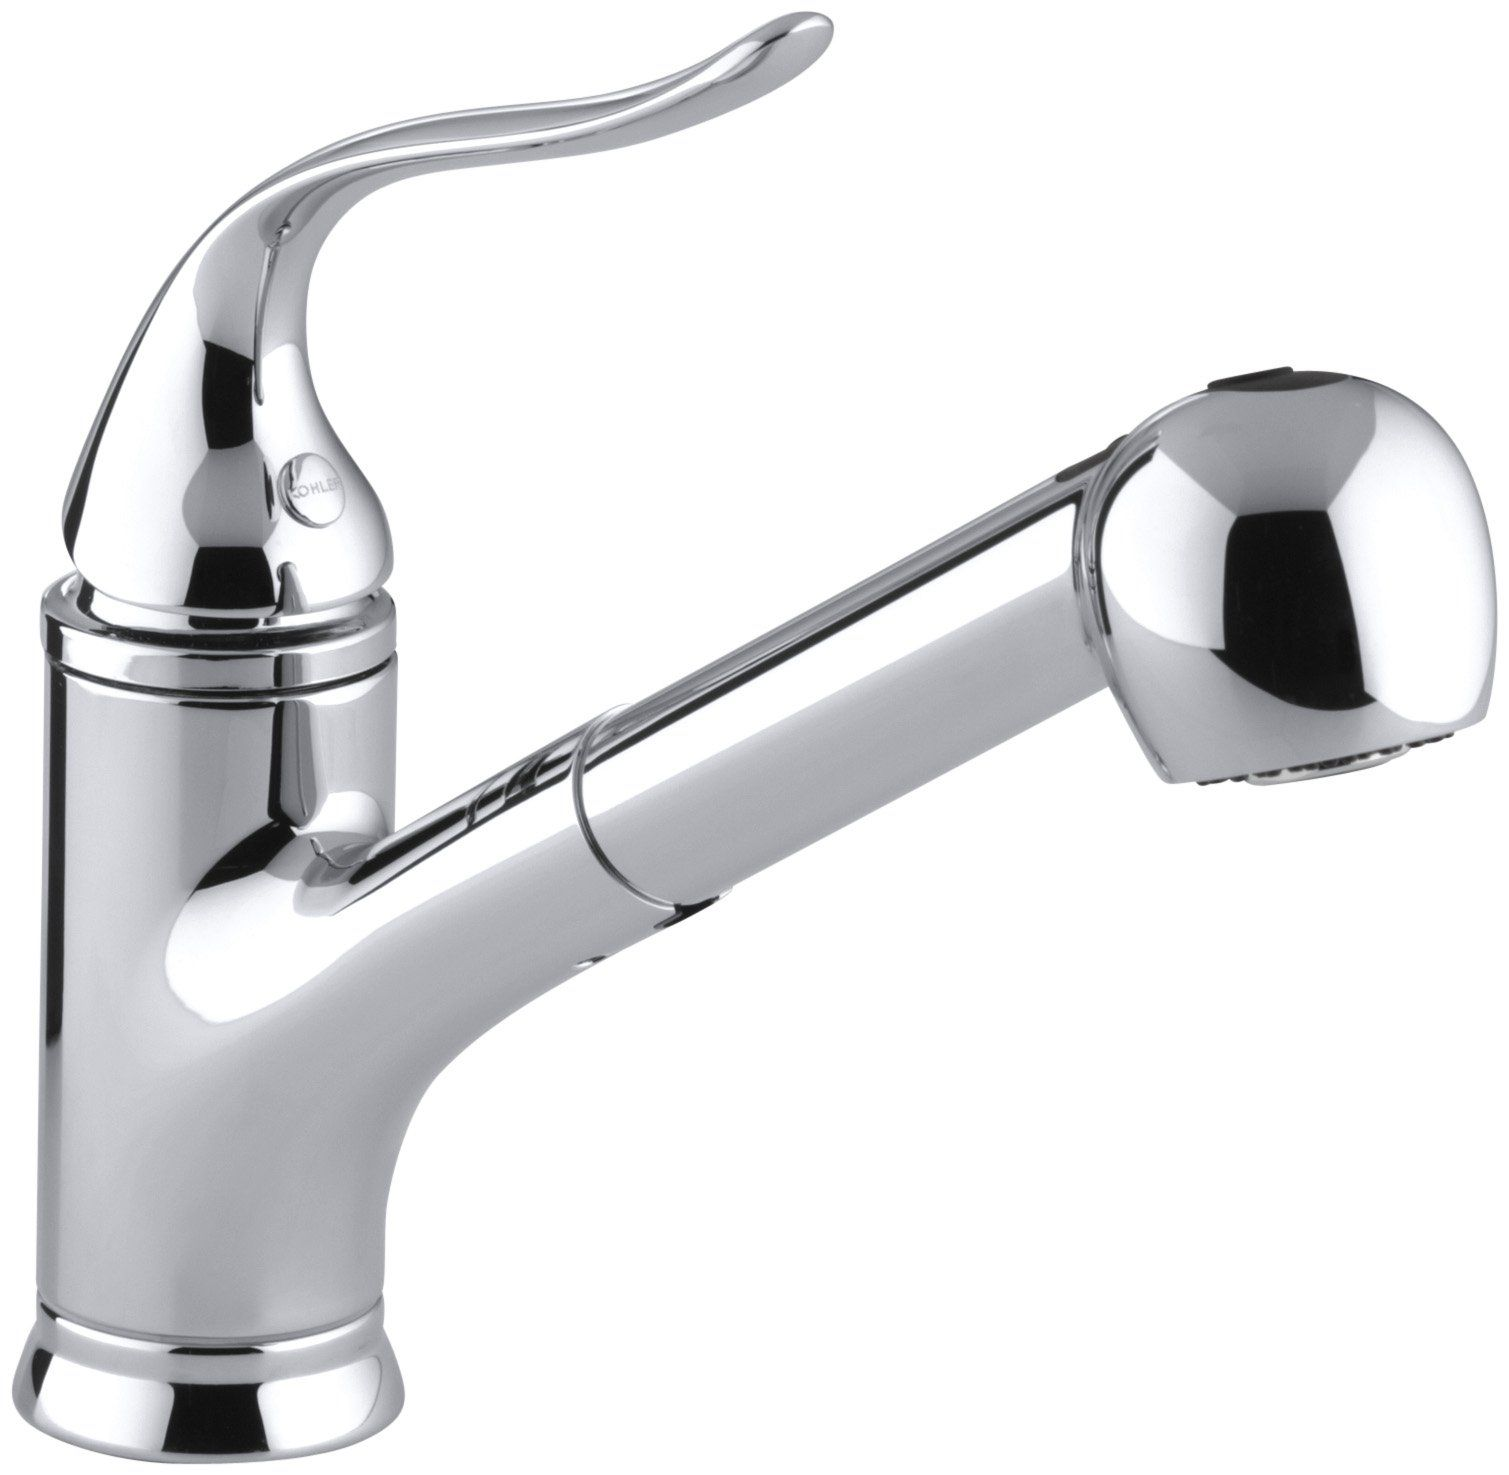 Kohler K 15160 96 Coralais Single Control Pullout Spray Kitchen Sink Faucet Biscuit Touch O Kitchen Faucet Single Handle Kitchen Faucet Kitchen Sink Faucets